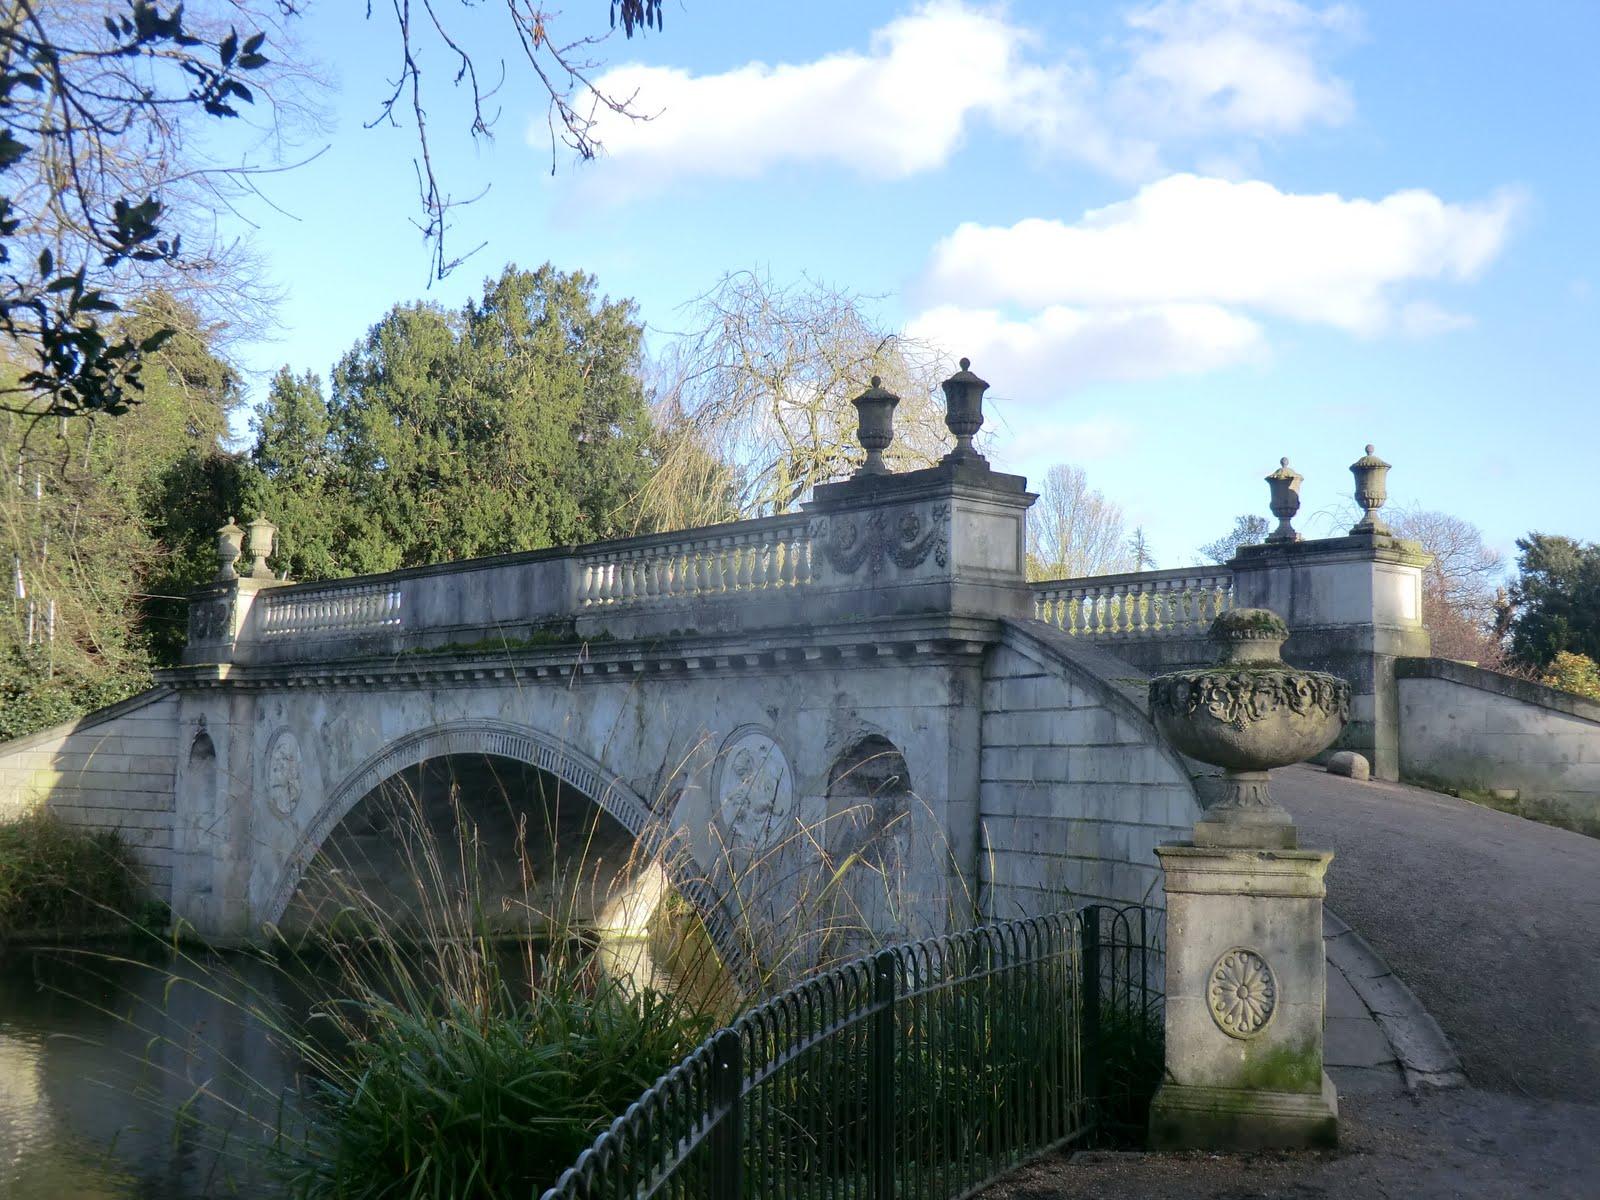 CIMG2527 Classic Bridge, Chiswick House